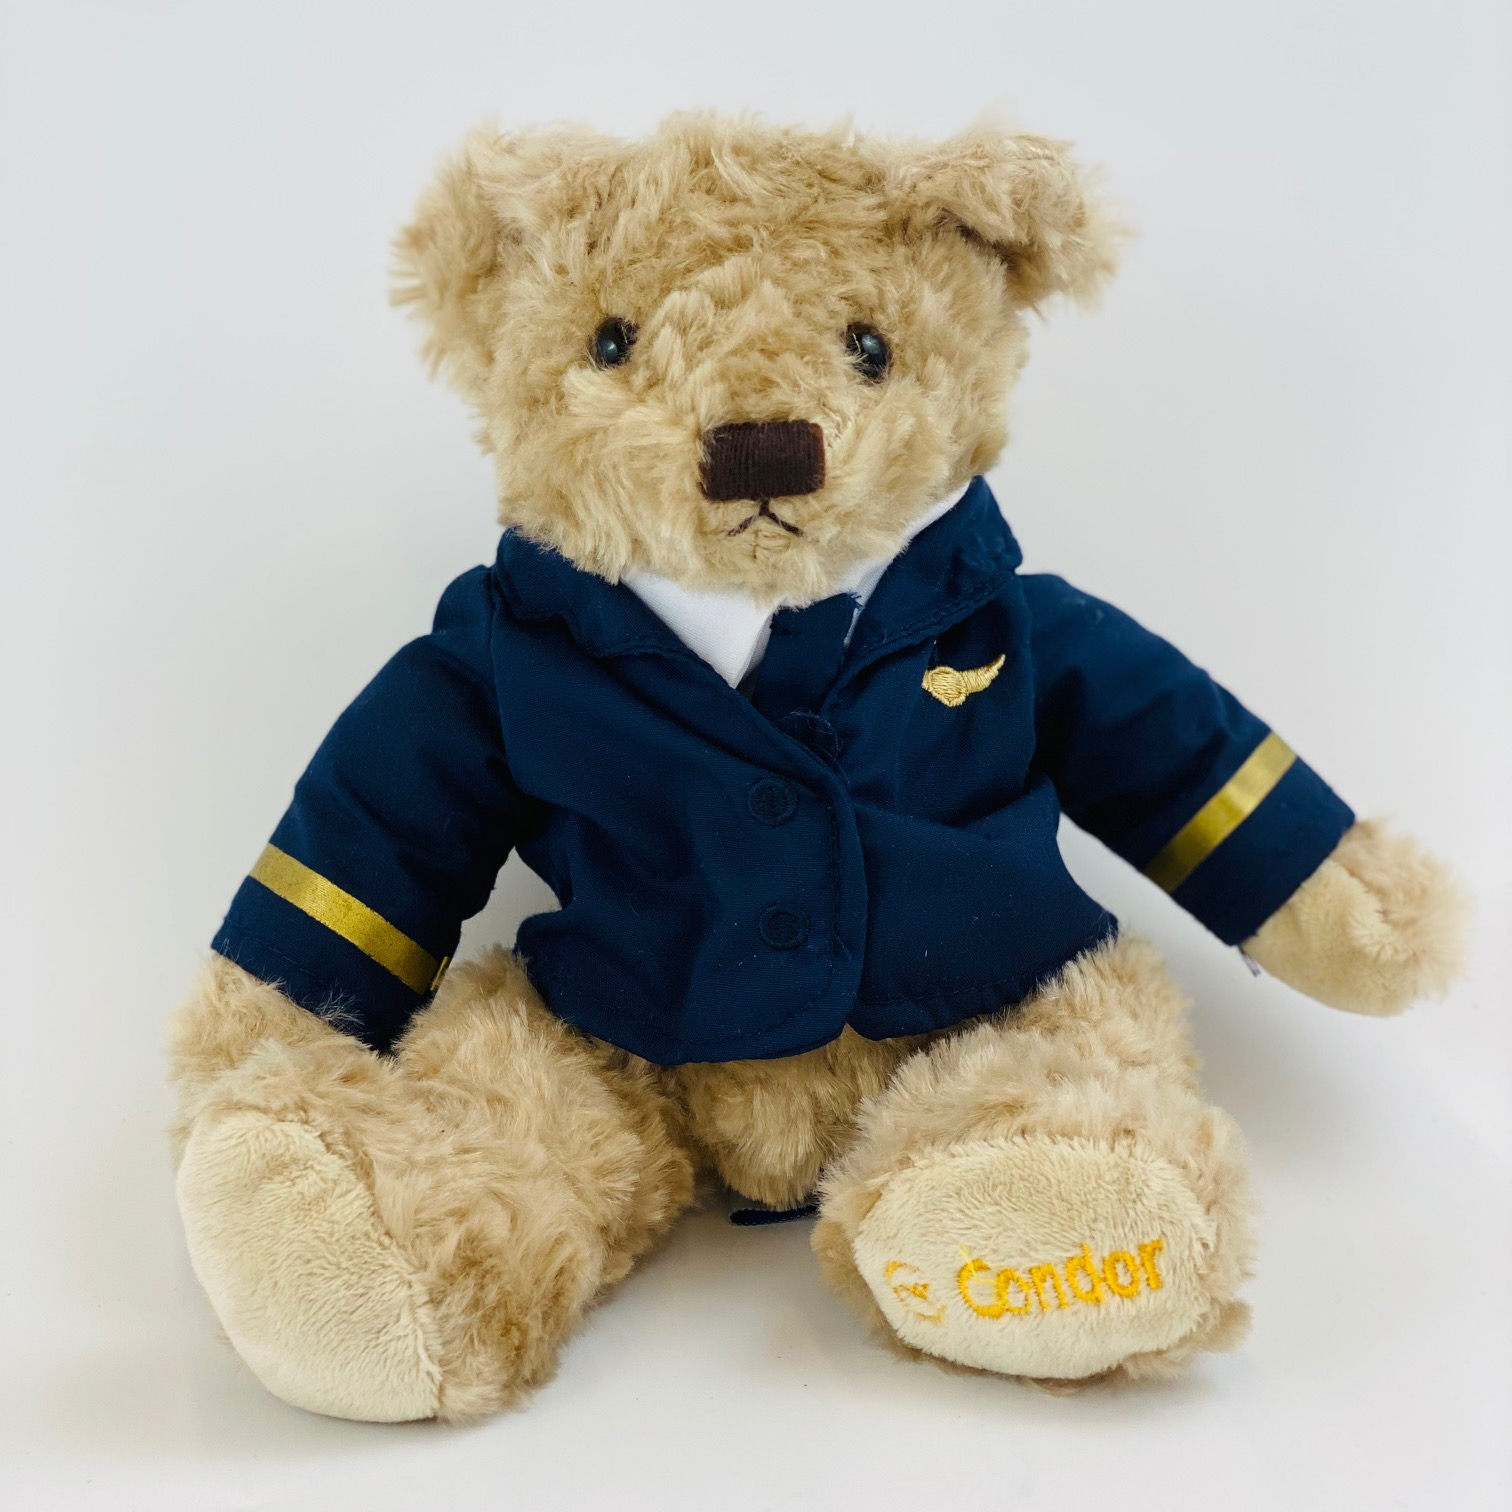 Steward-Teddybär in Condor Uniform